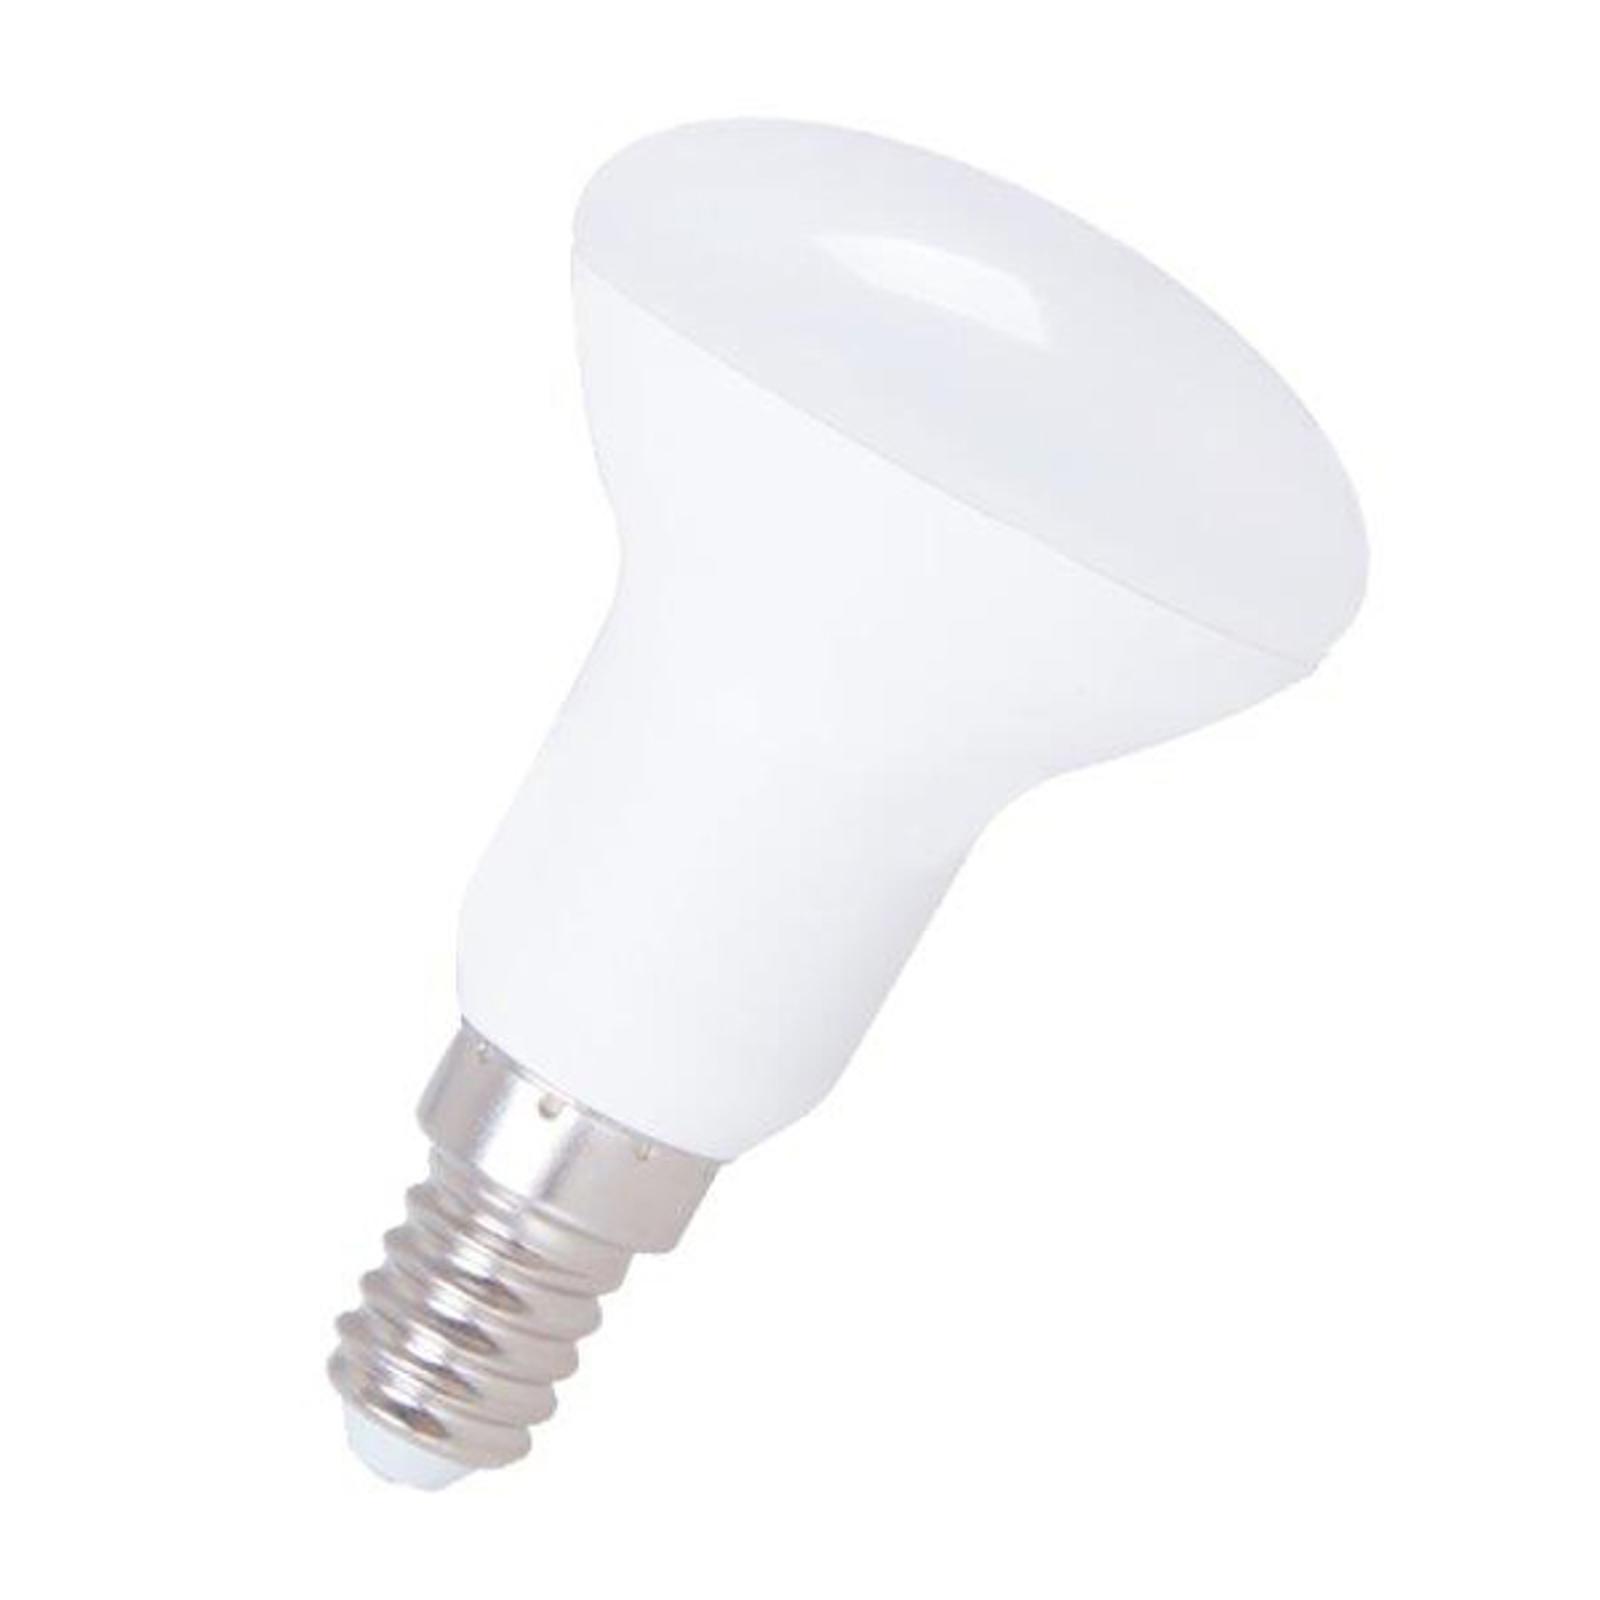 E14 5W R50 830 LED reflektorpære 120°